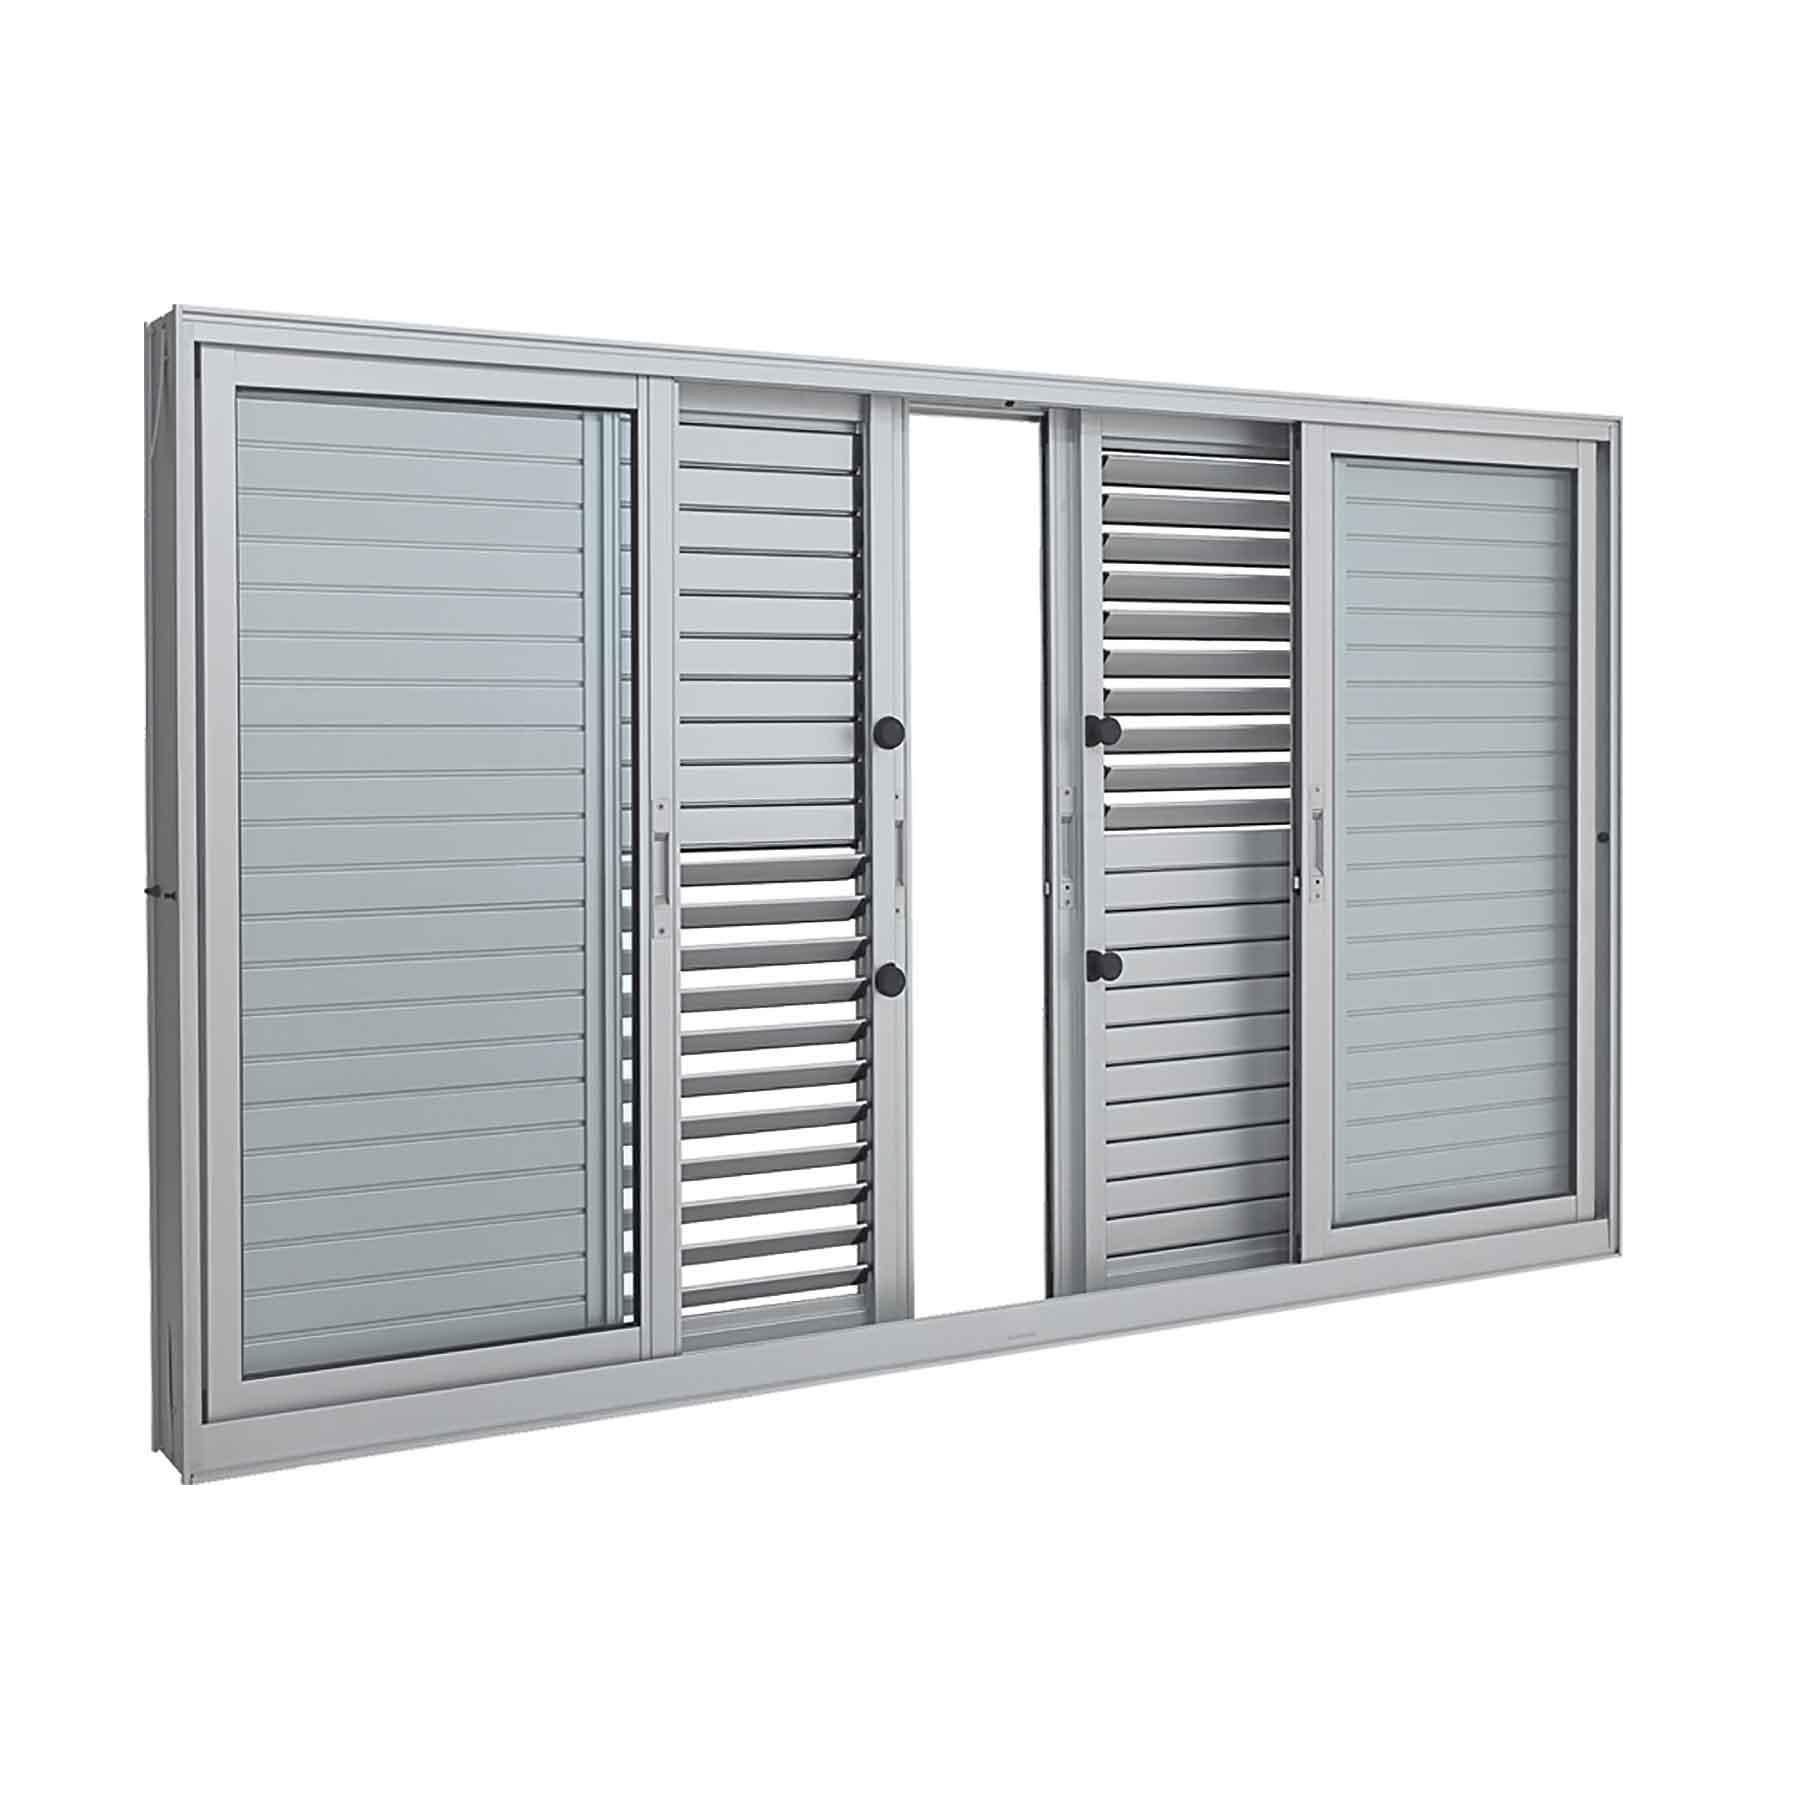 Janela Veneziana Multiflex Aluminium 6 Folhas 100x150 - INATIVO